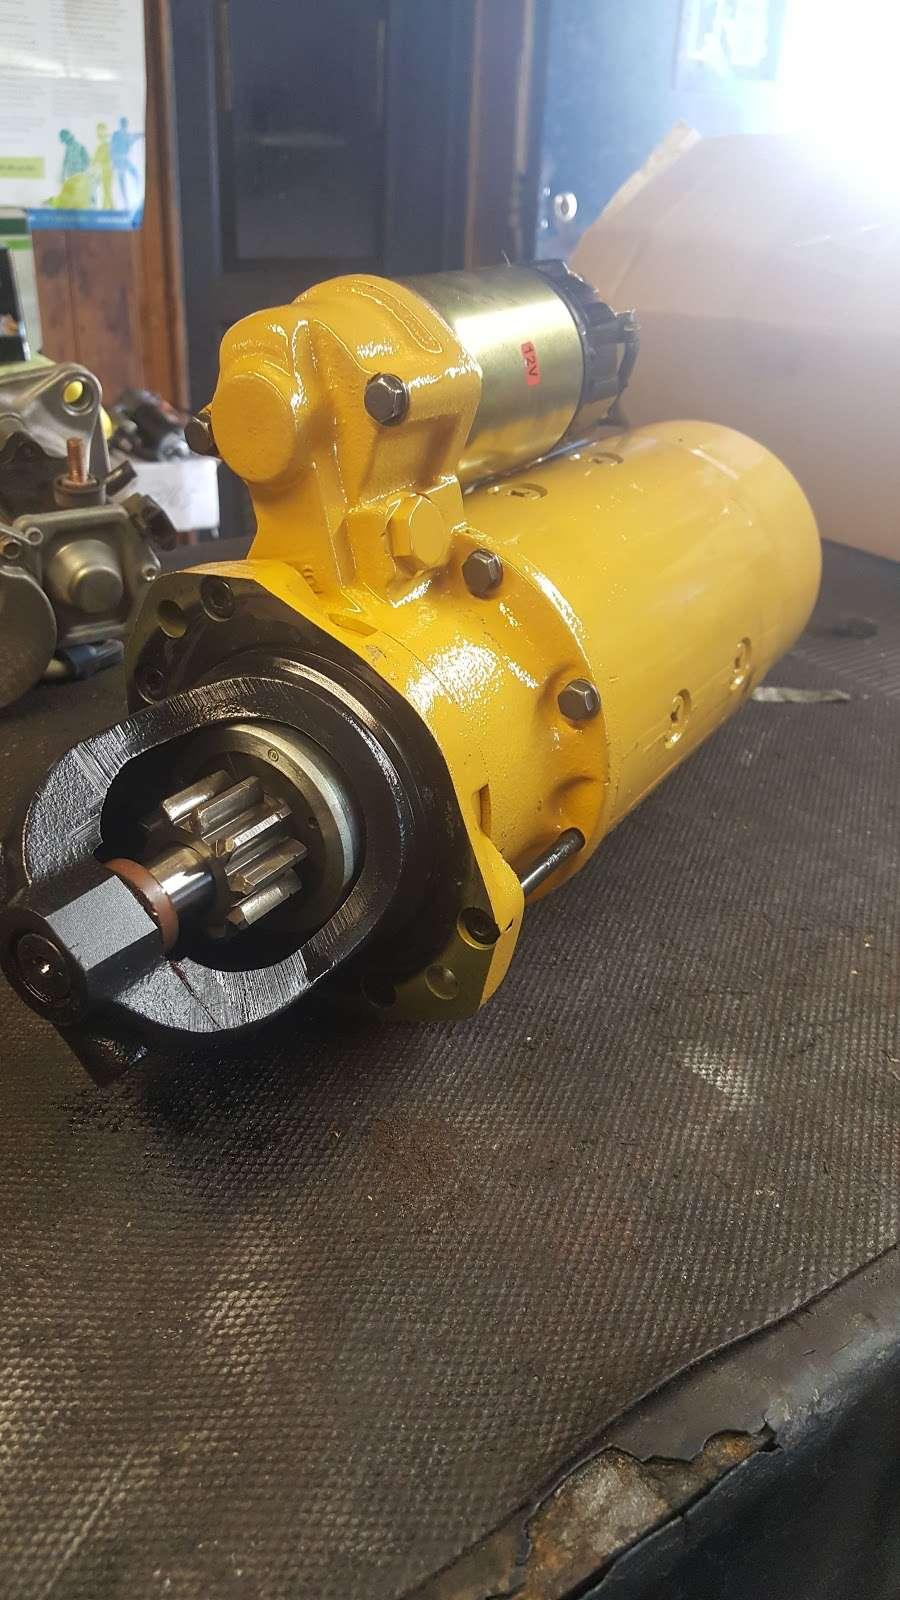 Rayelco Generator Company Inc. - car repair  | Photo 3 of 6 | Address: 7 Ave B, Lodi, NJ 07644, USA | Phone: (973) 777-3514